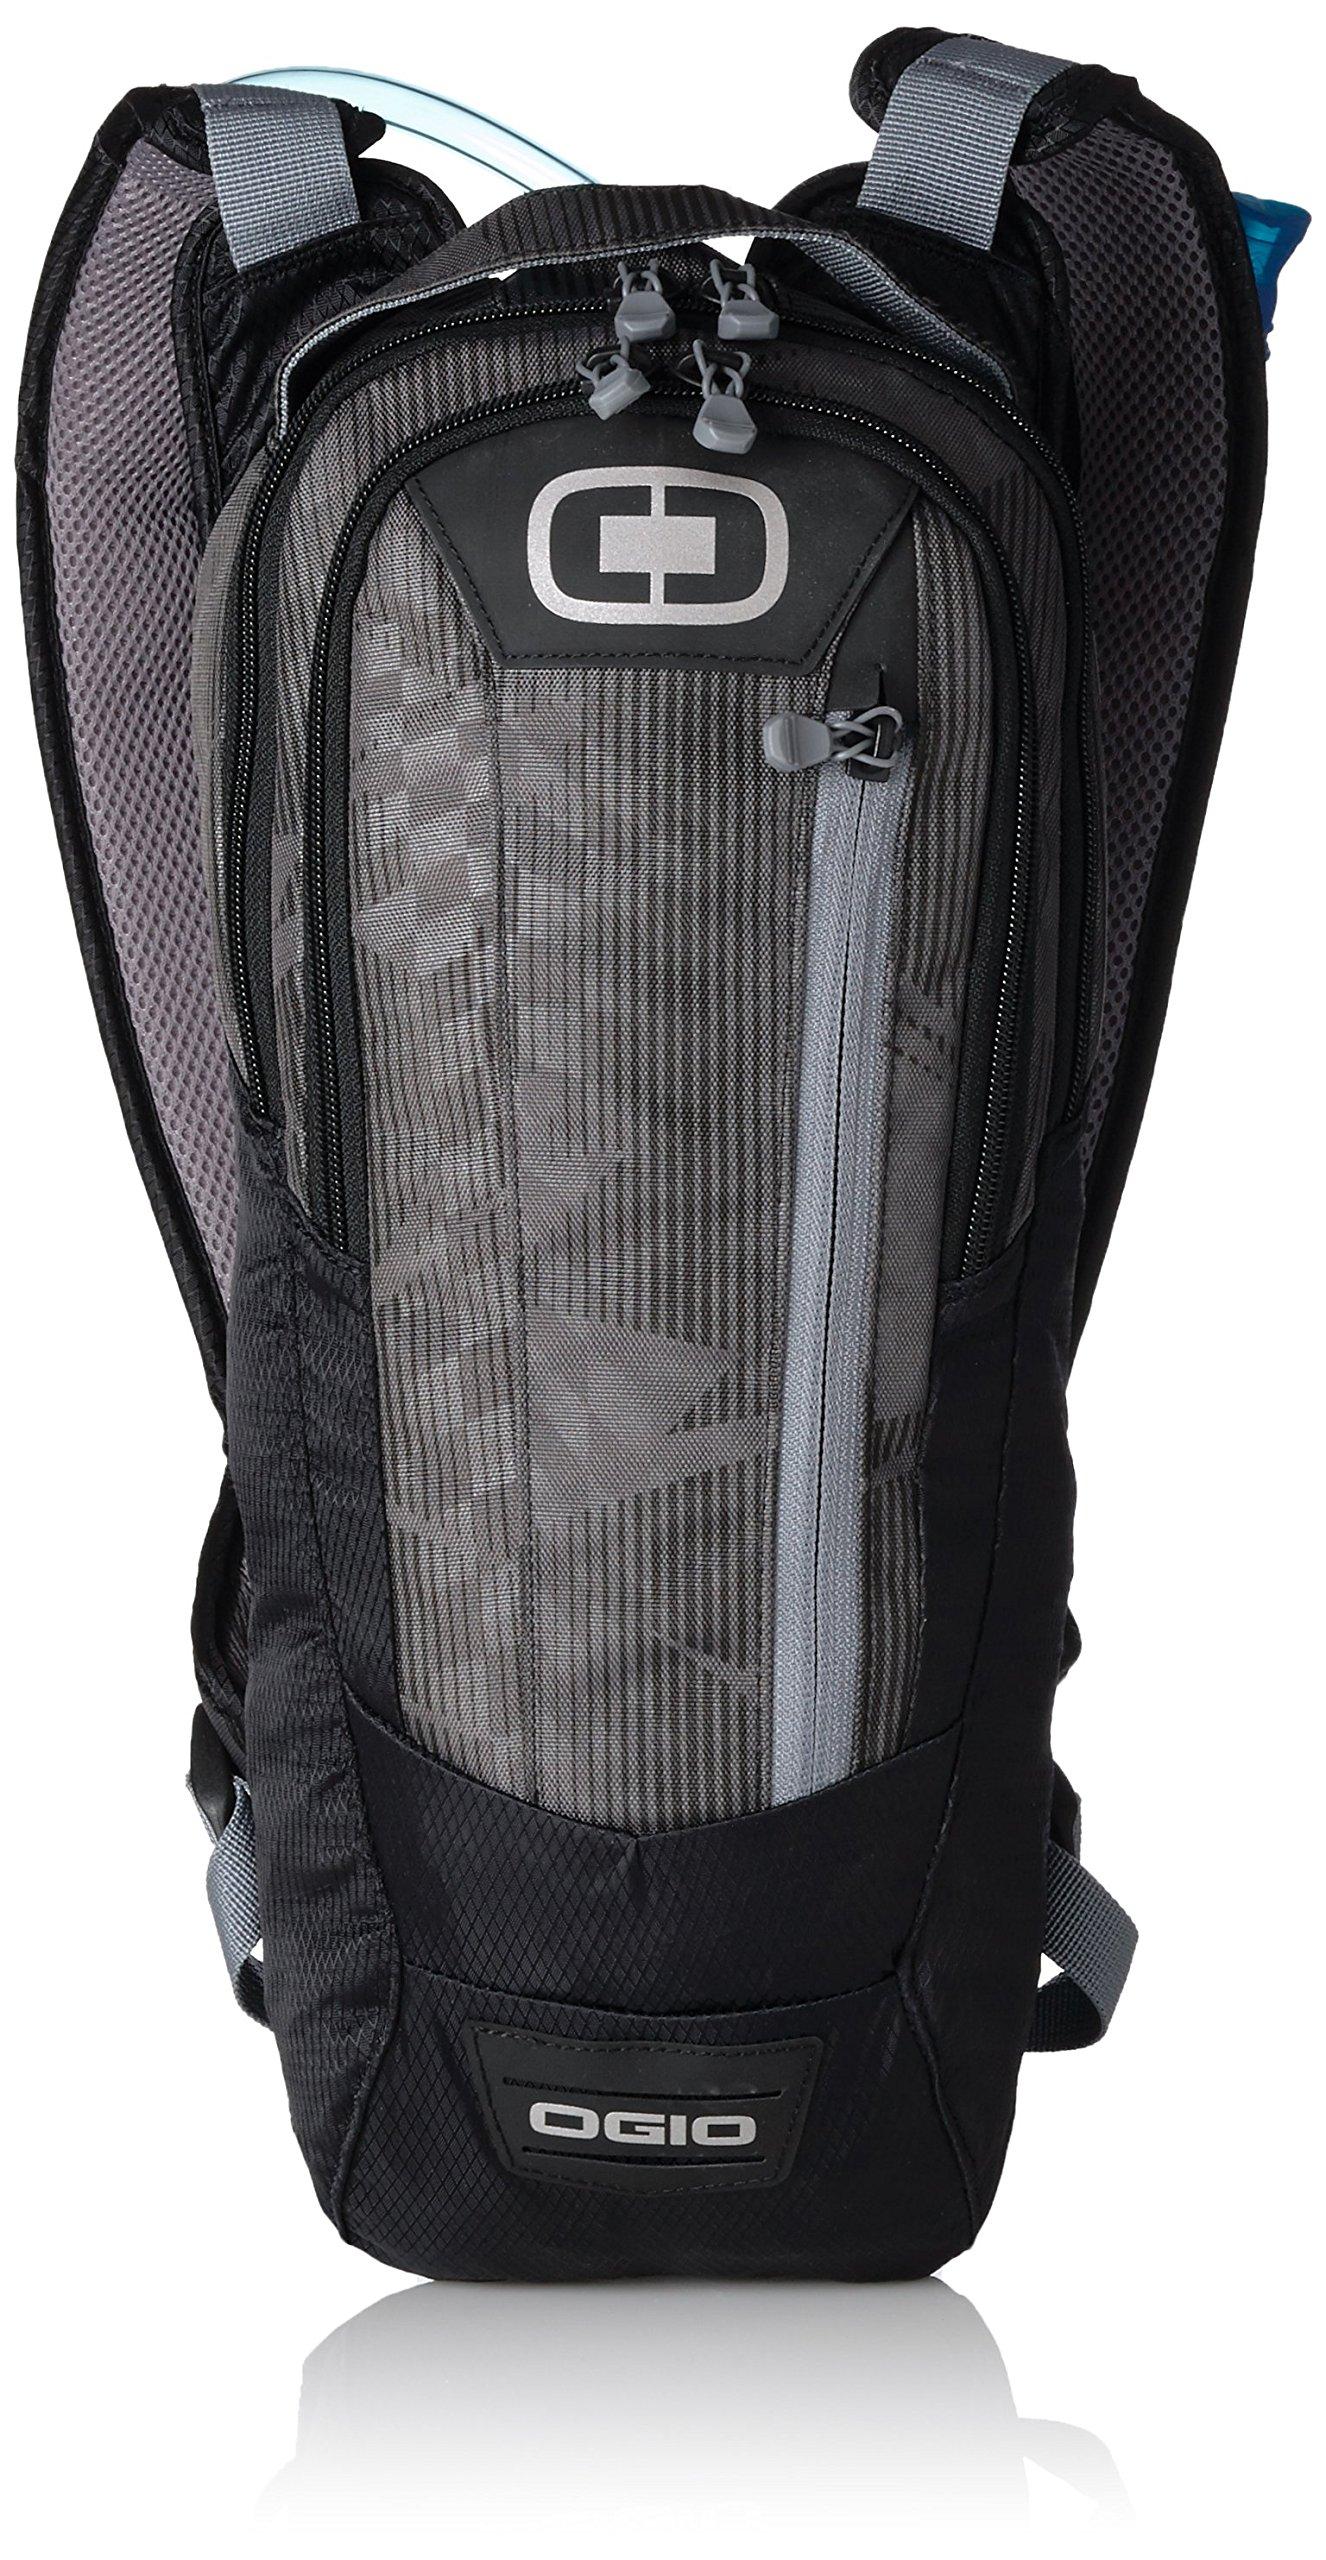 OGIO 122006.03 Atlas 100 oz./3 Liter Hydration Pack - Stealth Black by OGIO